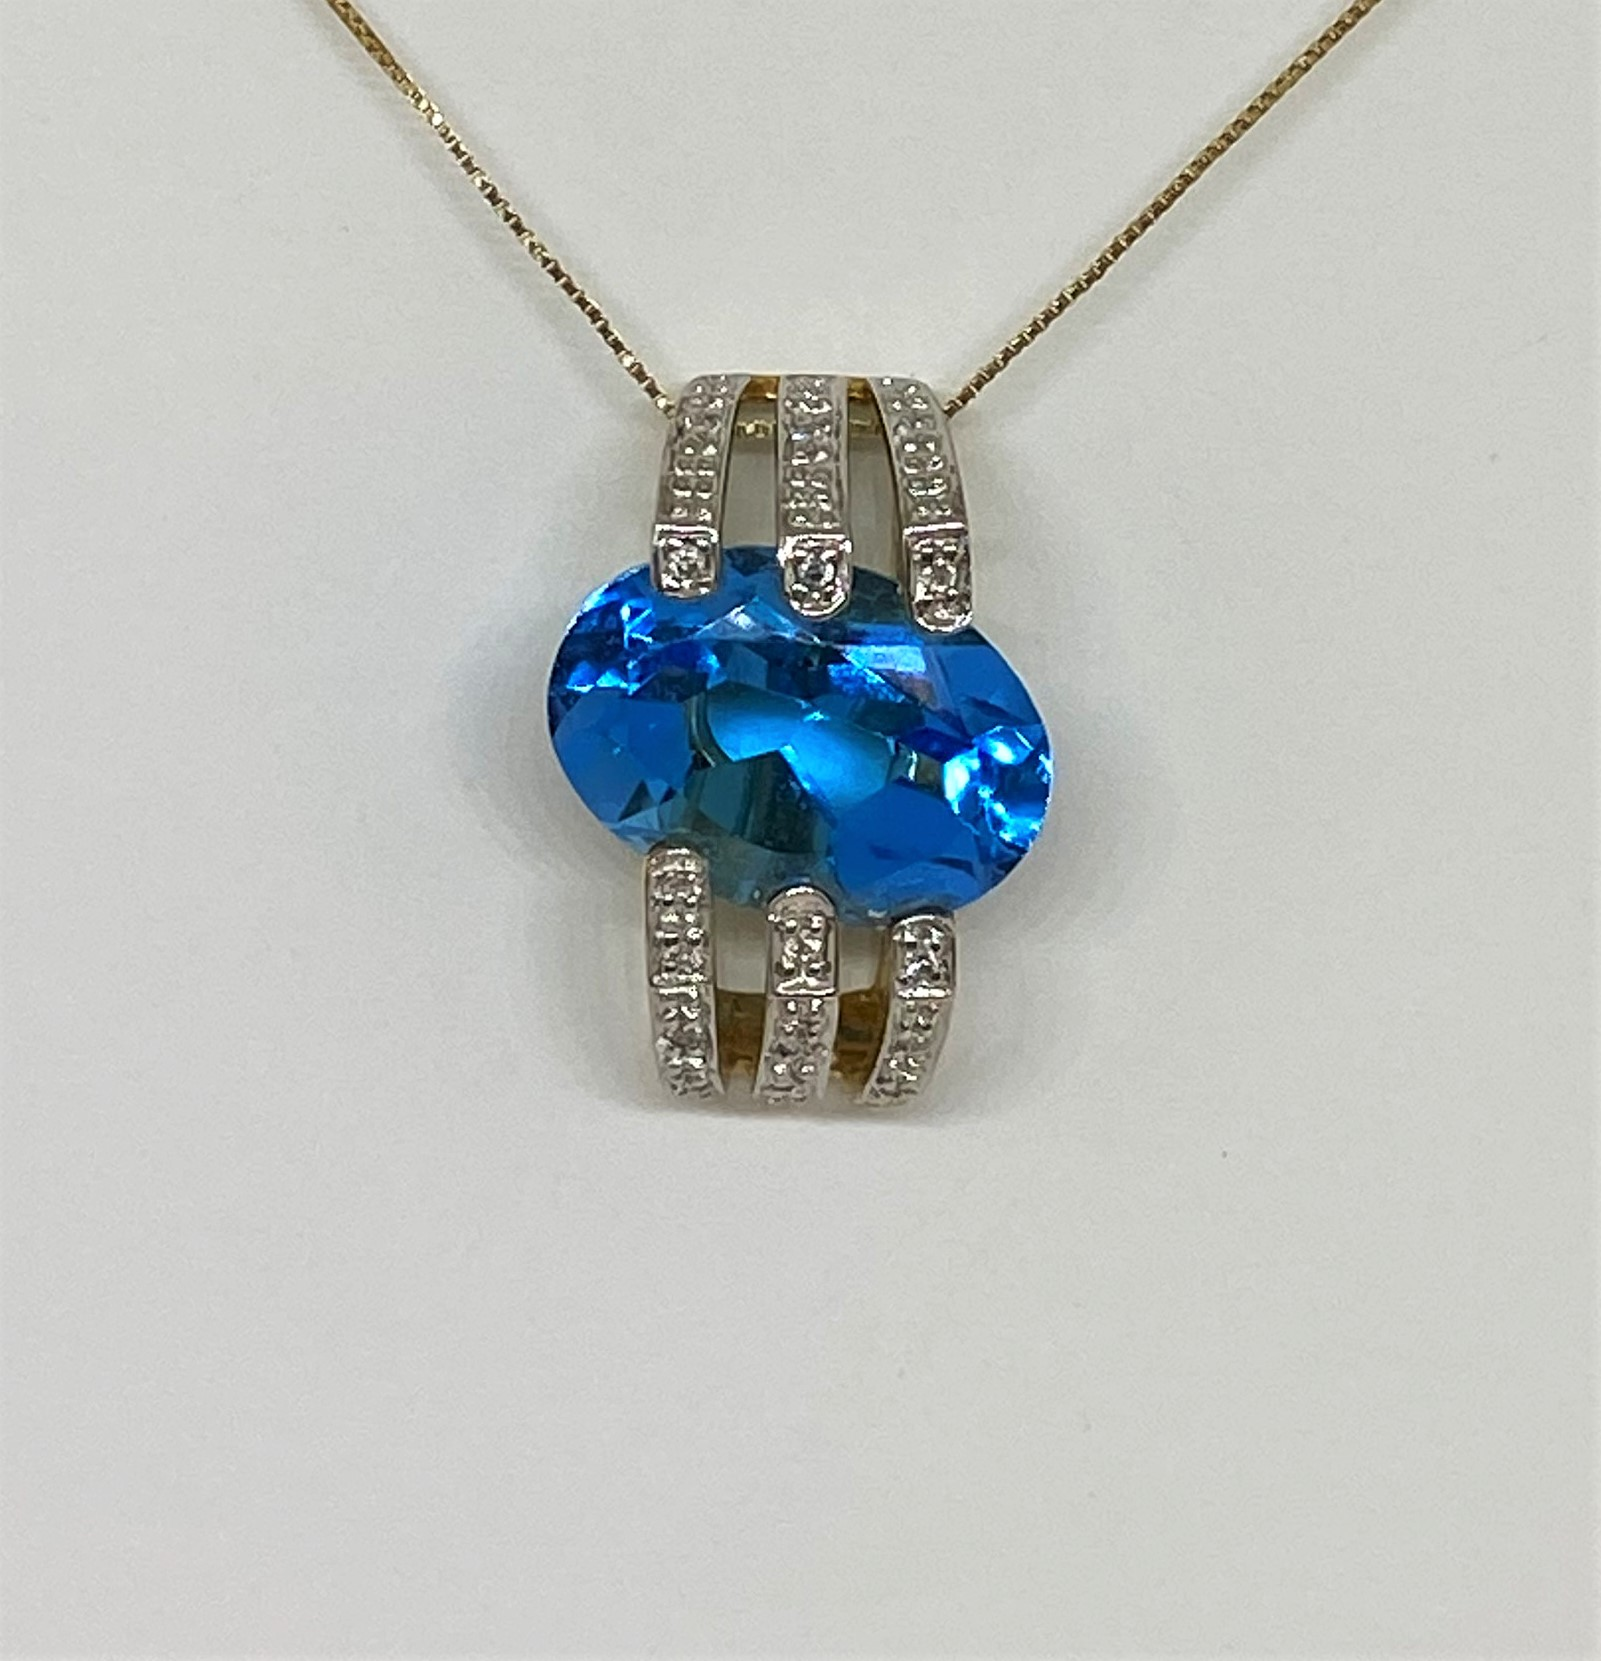 2.50 Carats Blue Topaz Pendant